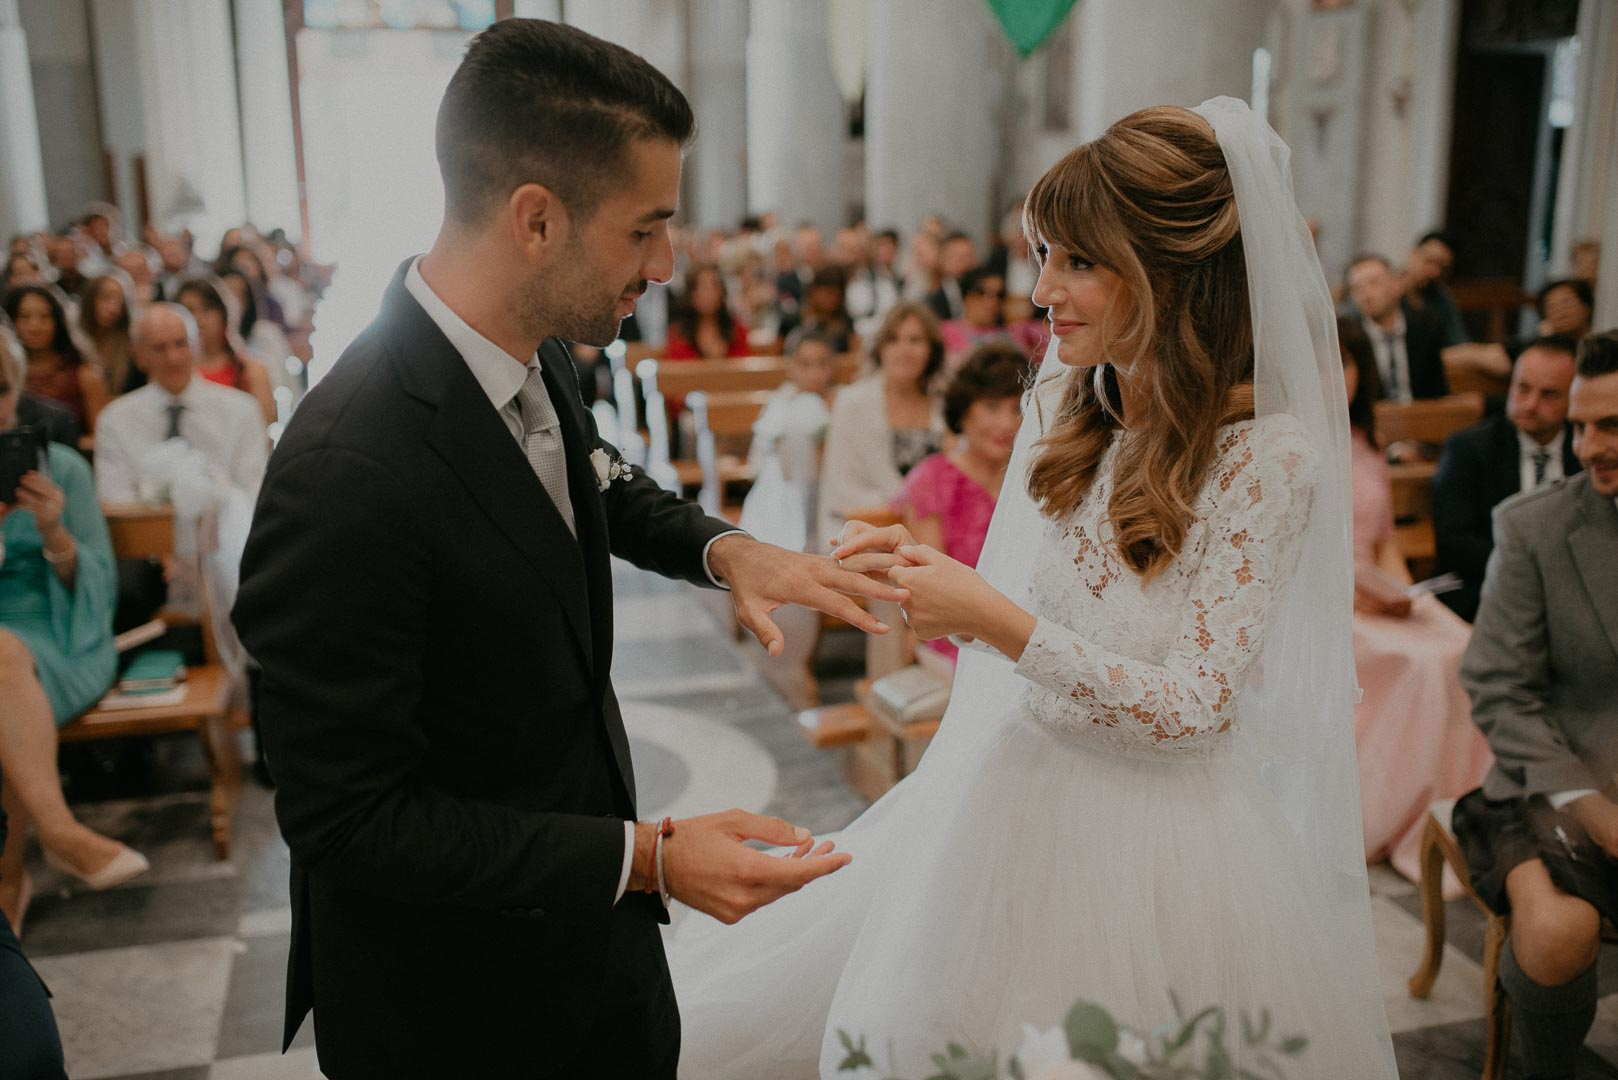 wedding-photographer-destination-fineart-bespoke-reportage-napoli-nabilah-vivianeizzo-spazio46-68